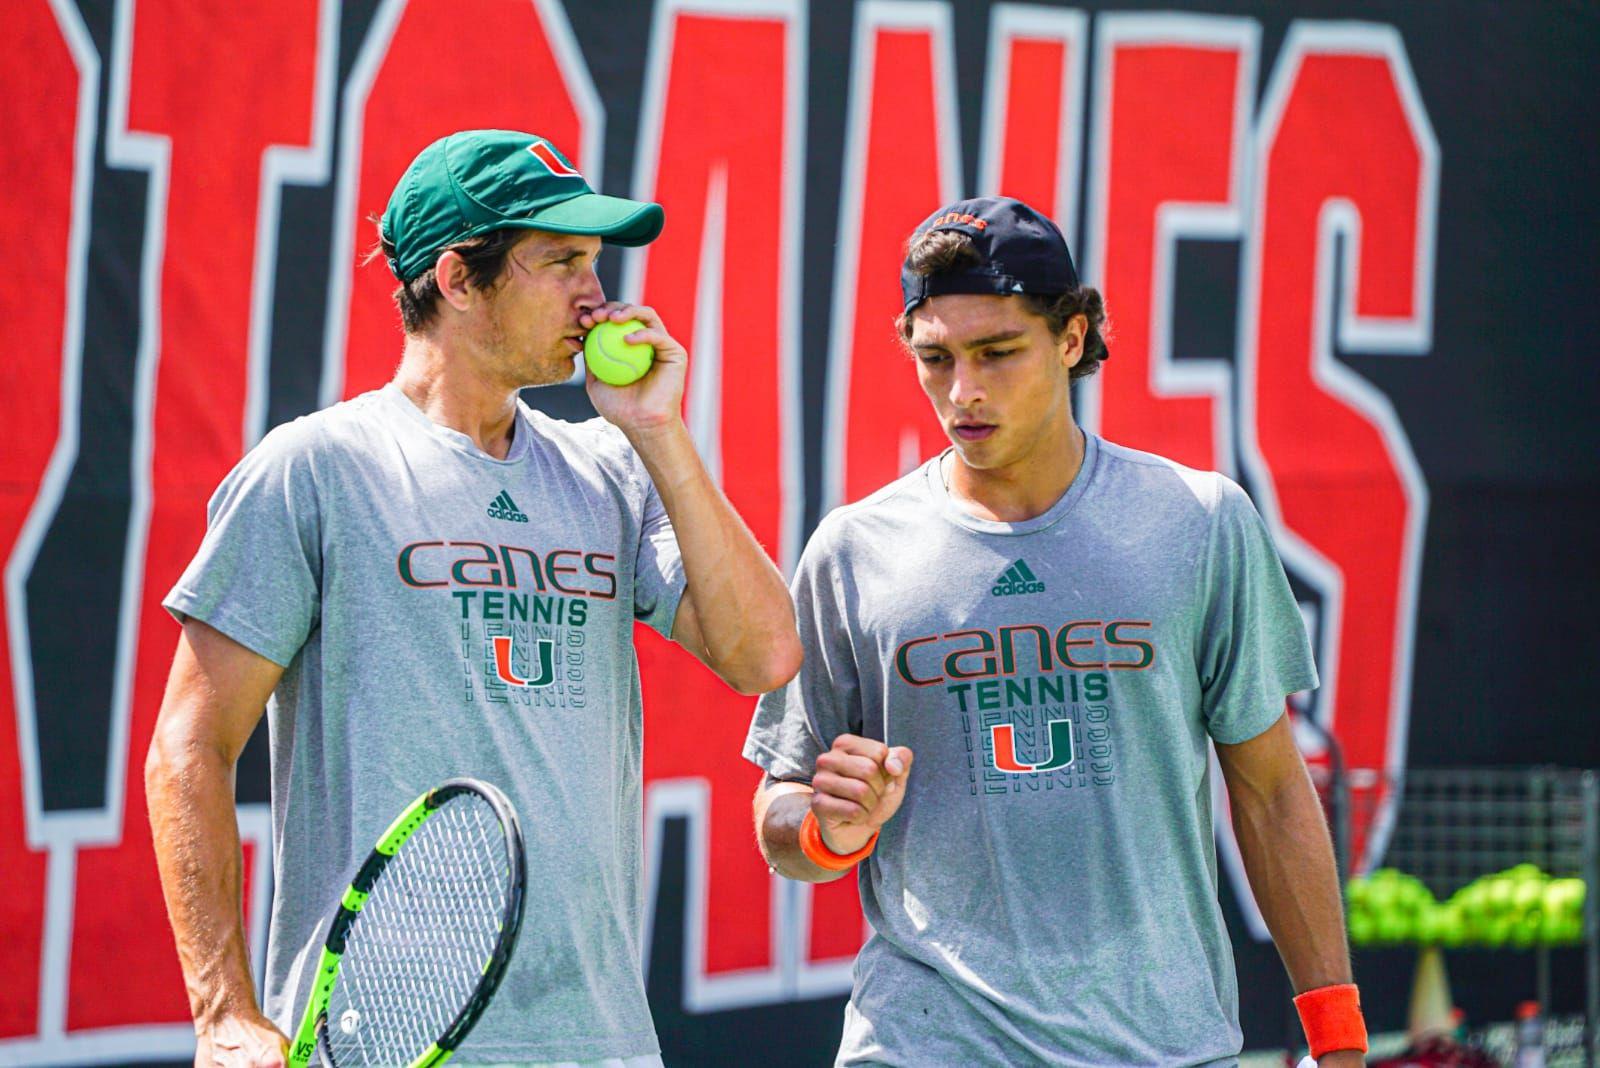 Miami Duo Ranked 11th in ITA Preseason Rankings